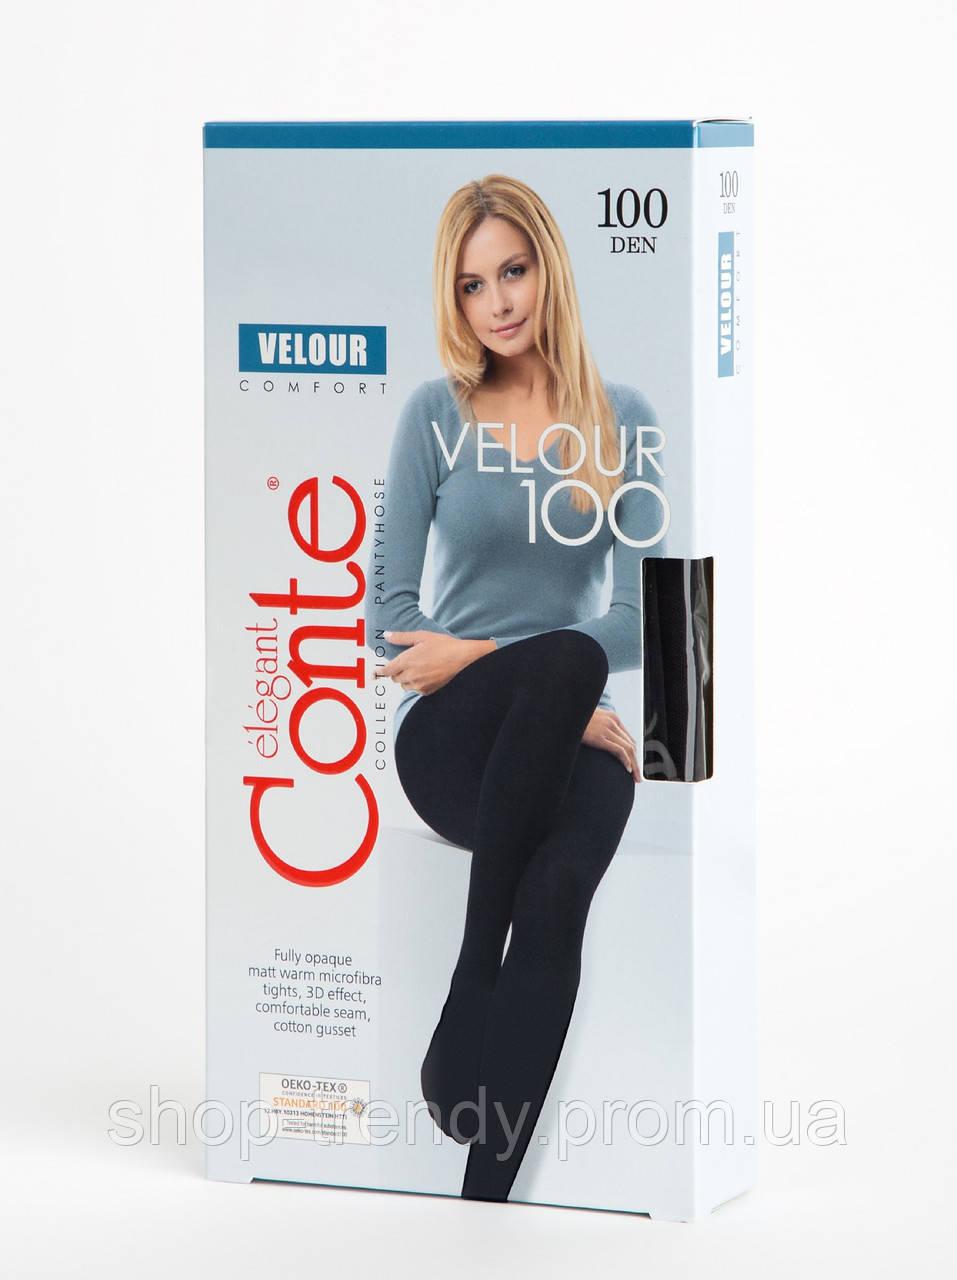 Матові колготки Velour 100 den Conte